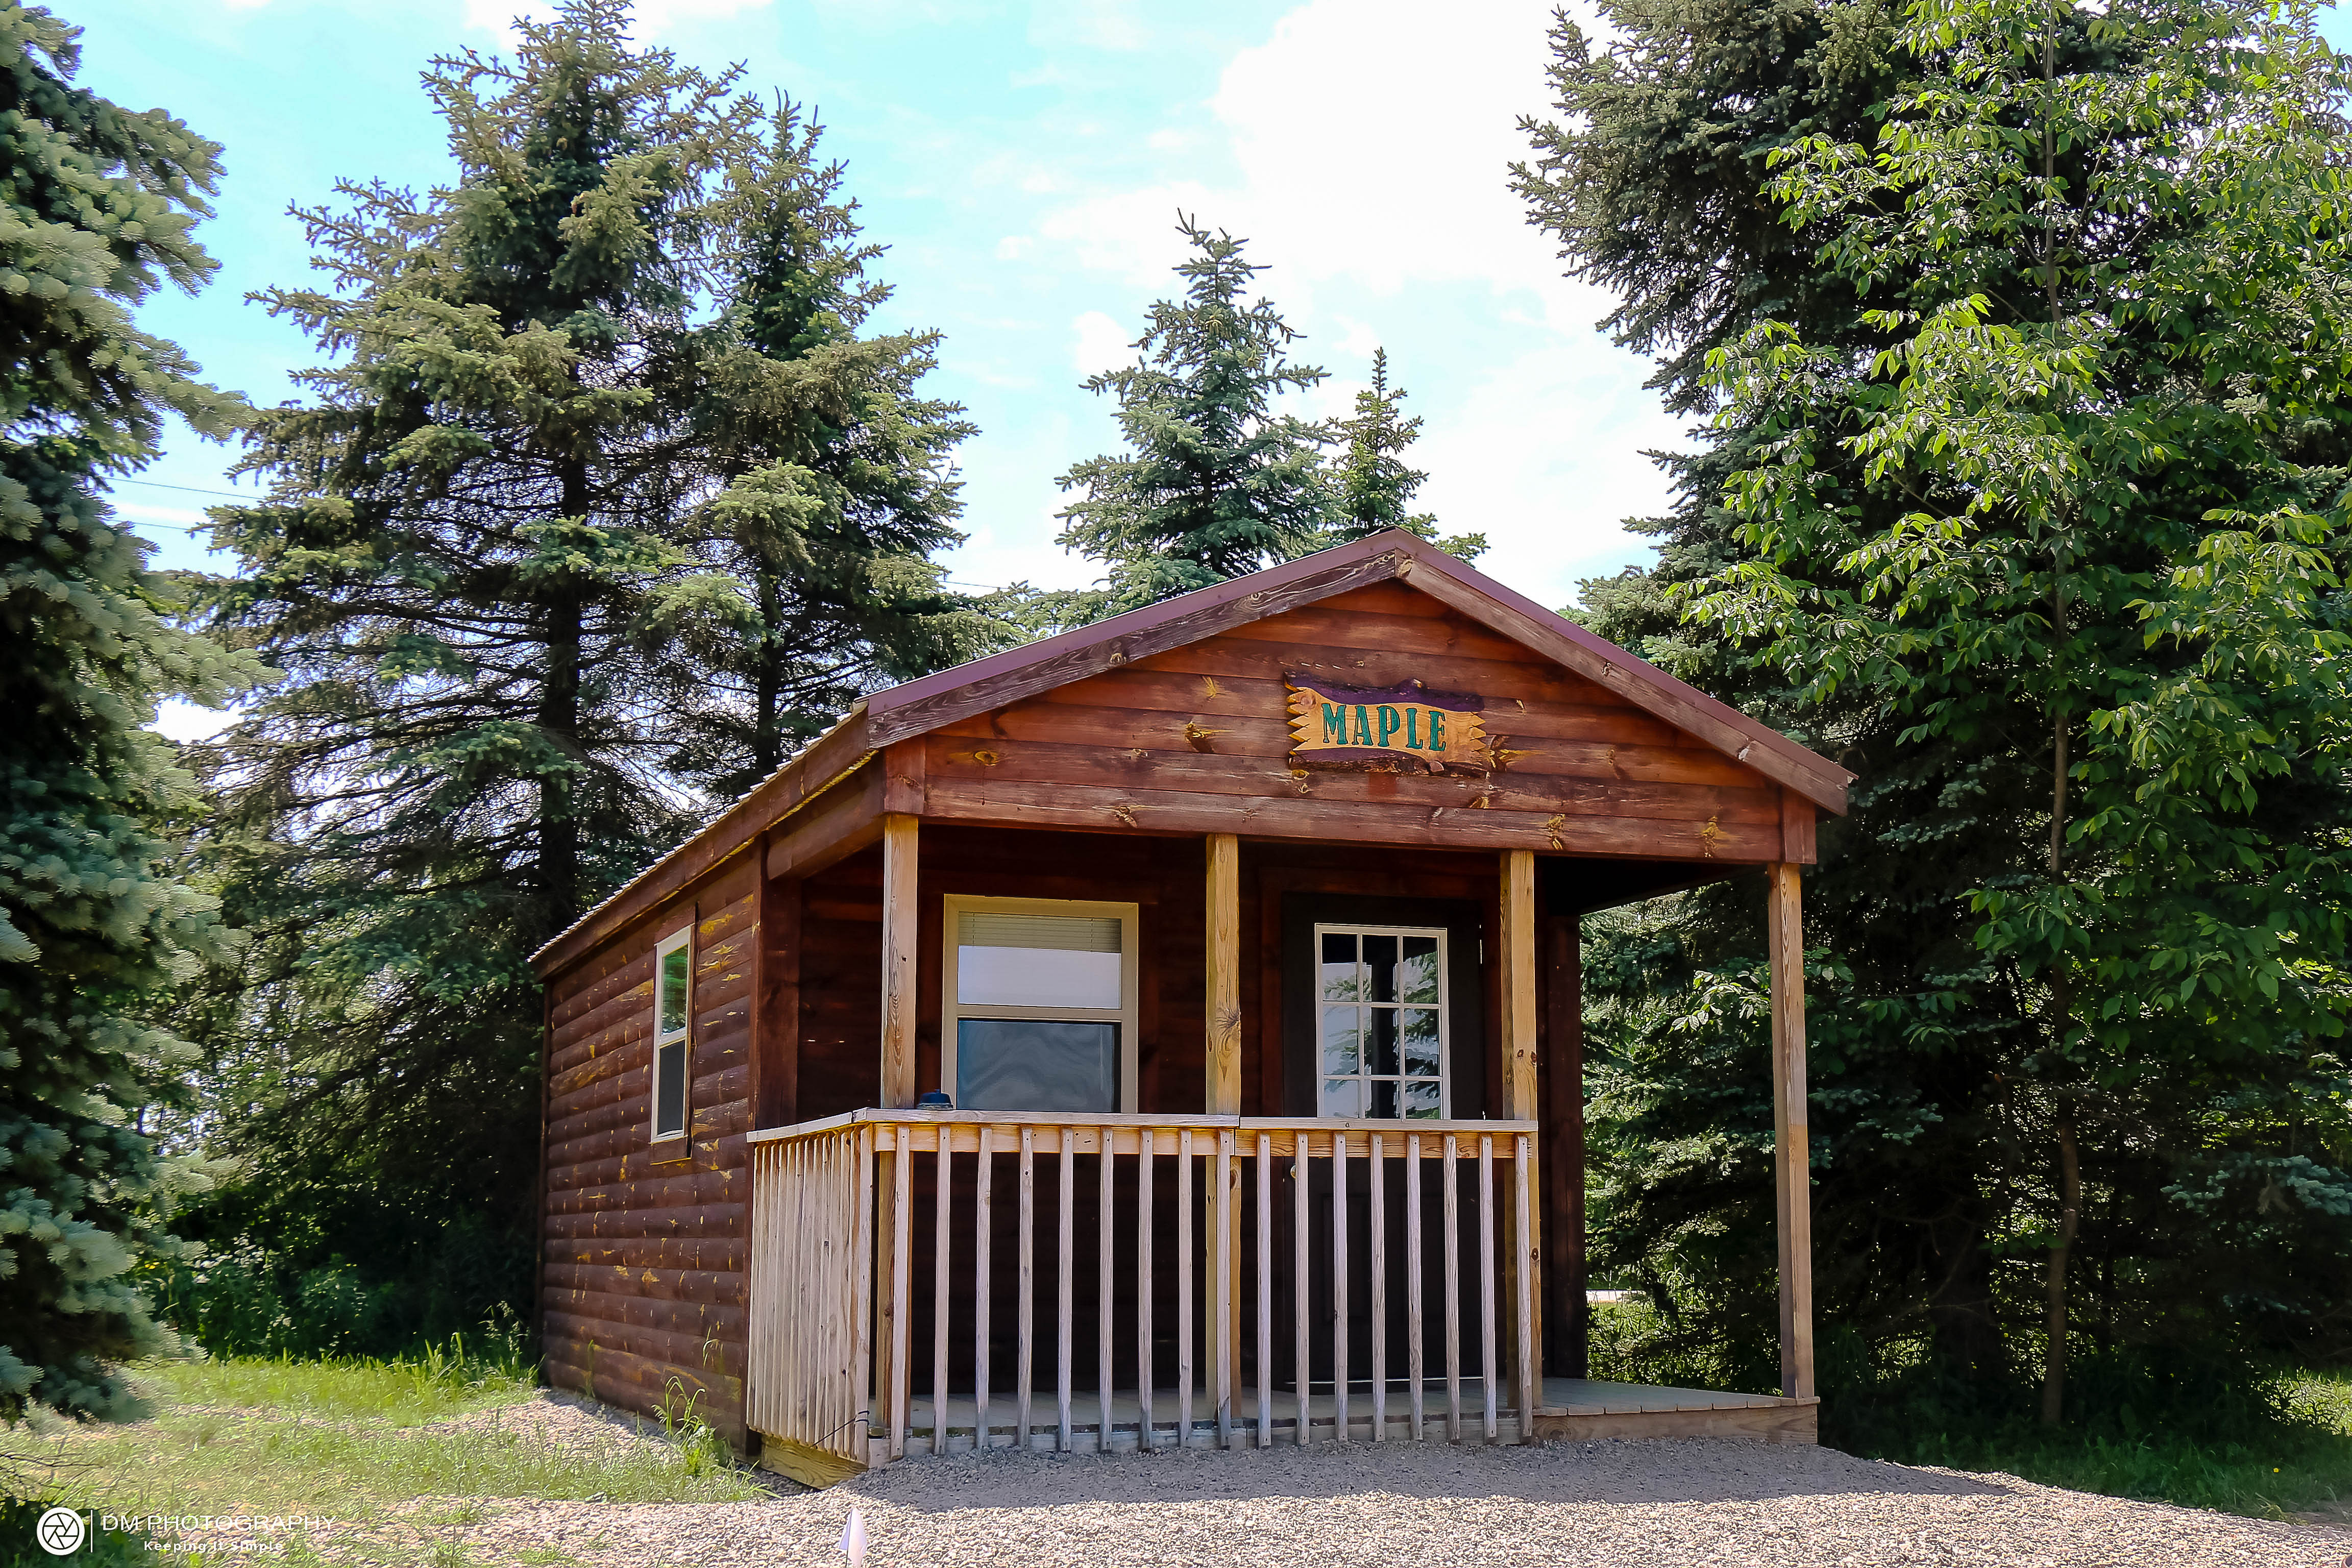 Maple Tall Pines Atv Park